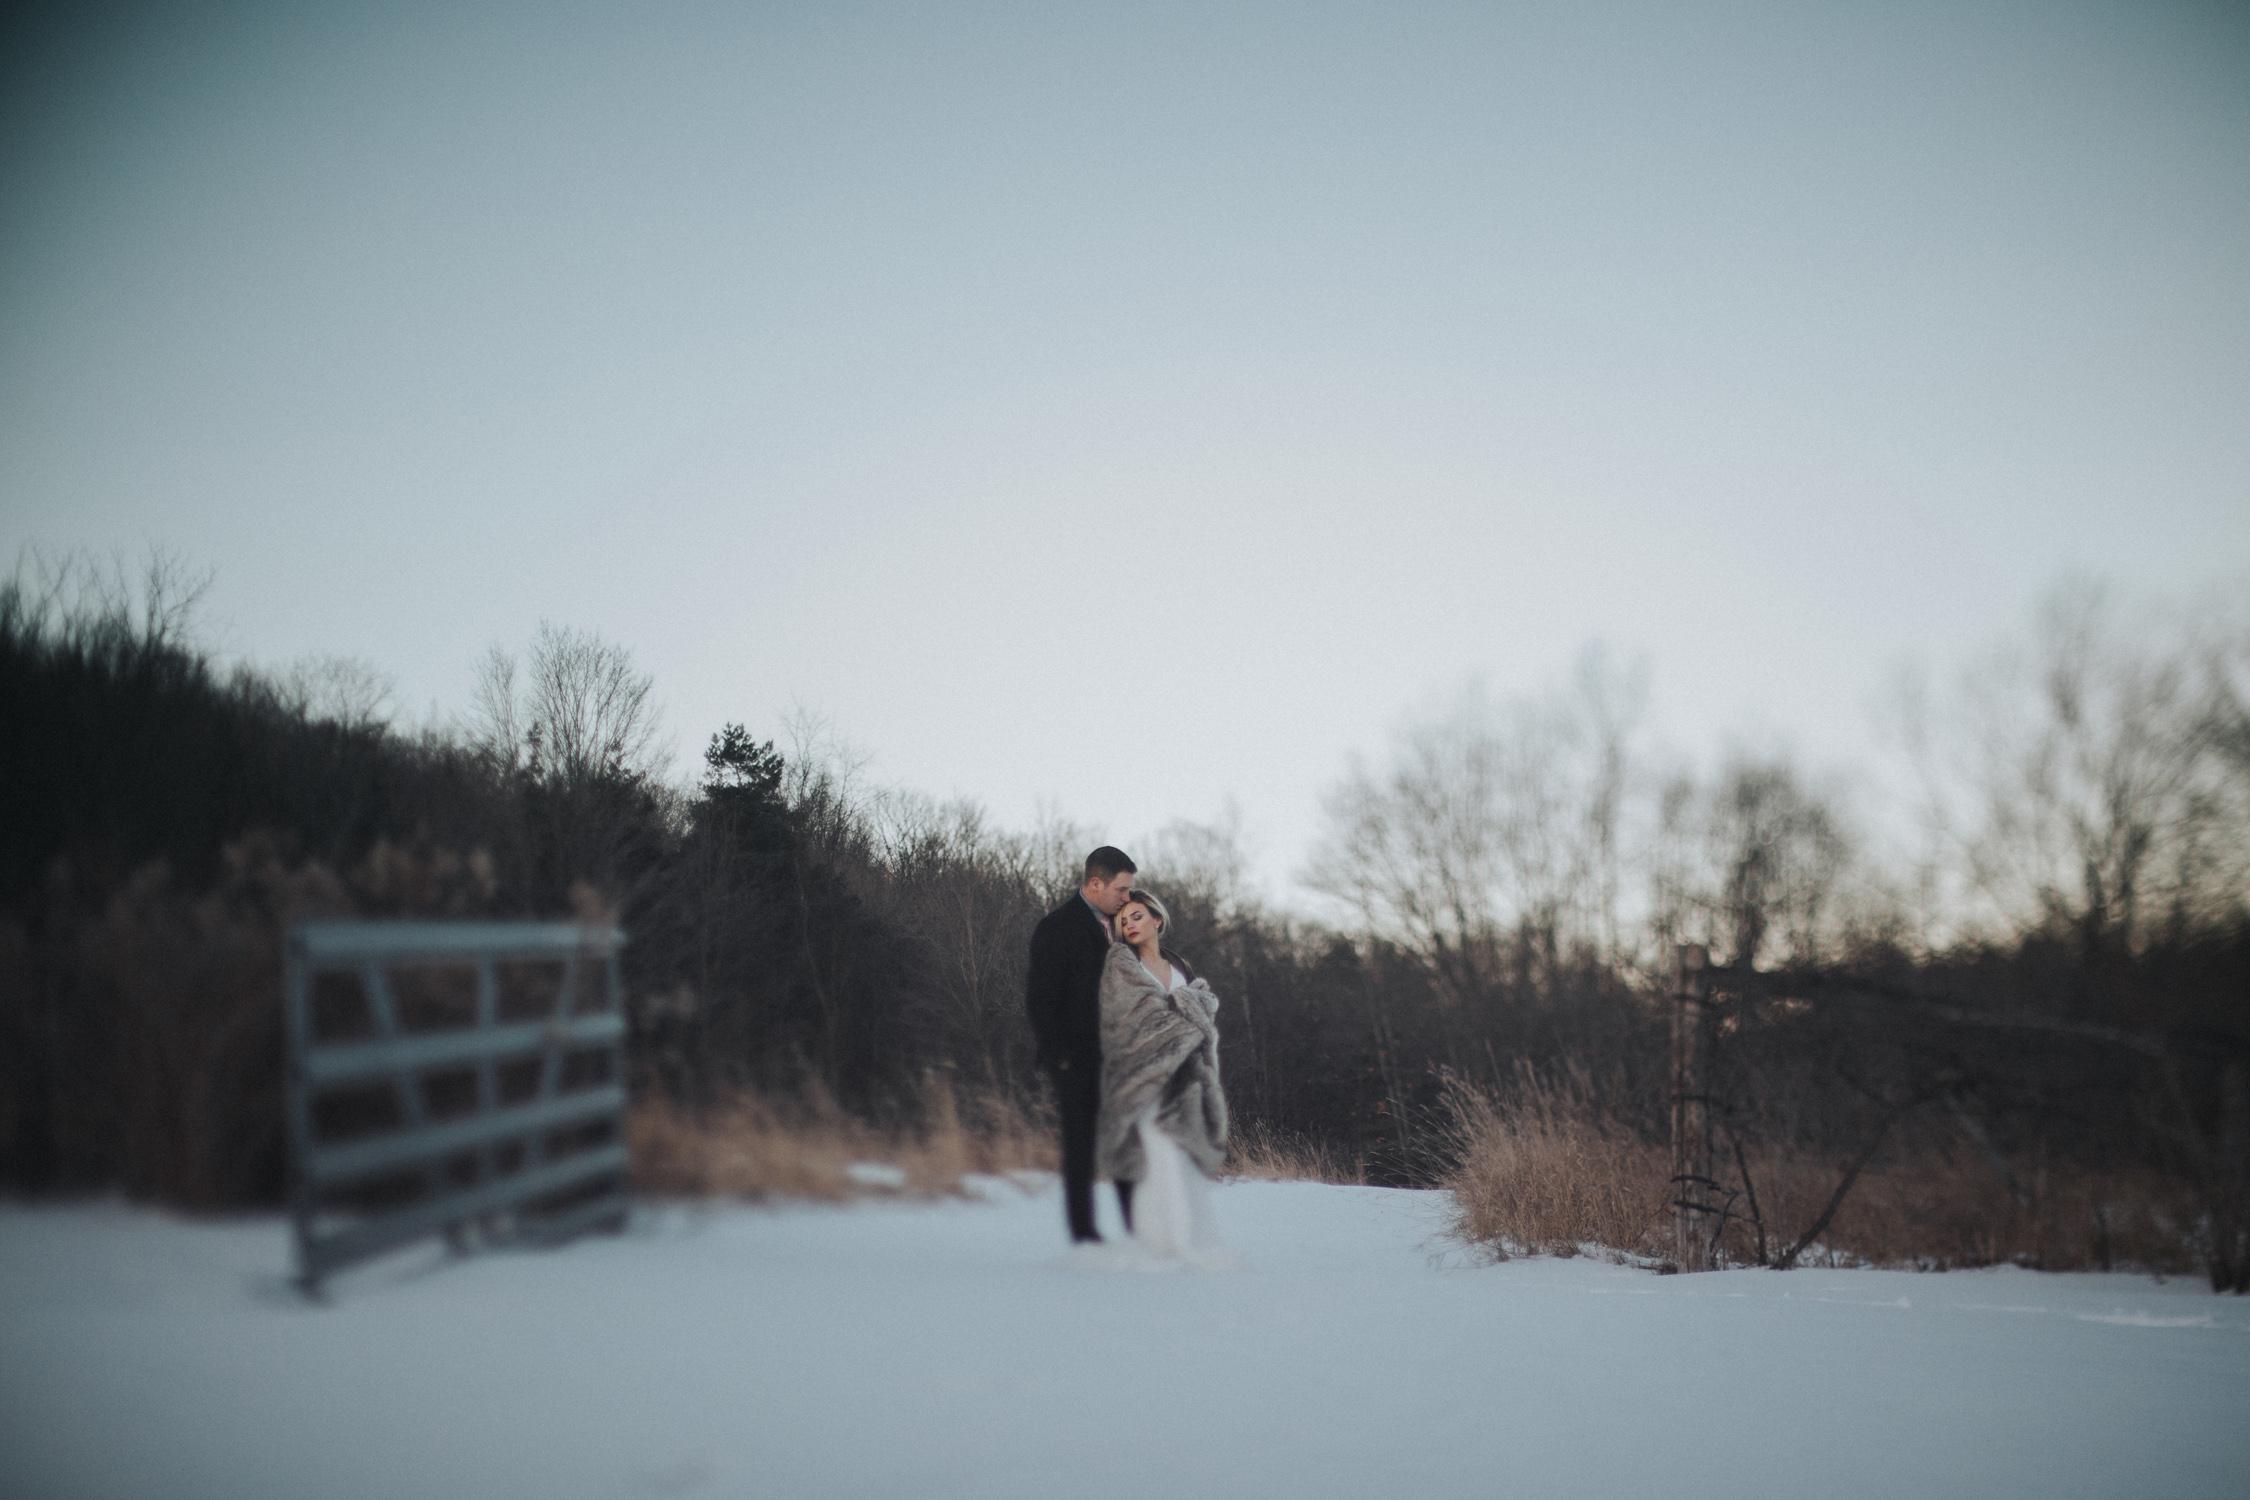 mnd_farm_winter_wedding_038.jpg